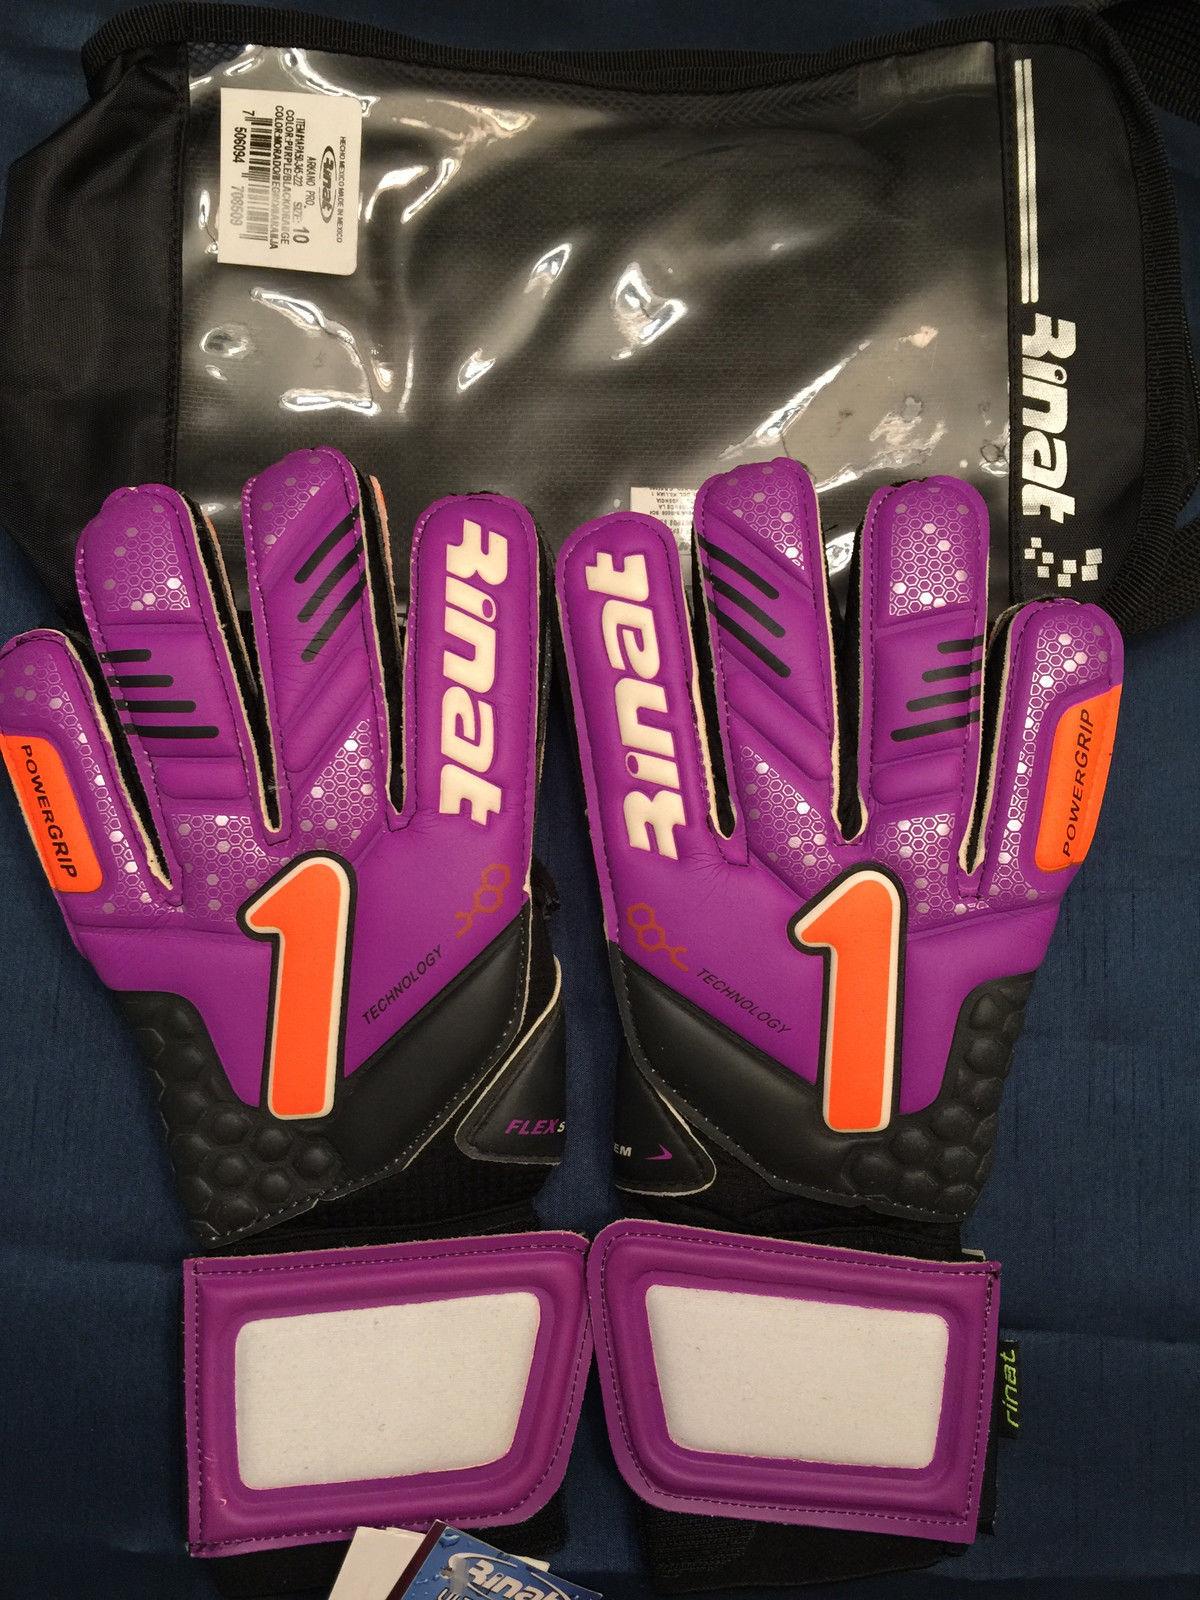 Goalkeeper New RINAT FENIX QUANTUM PRO GOALIE SOCCER GLOVE Size 8 Futbol